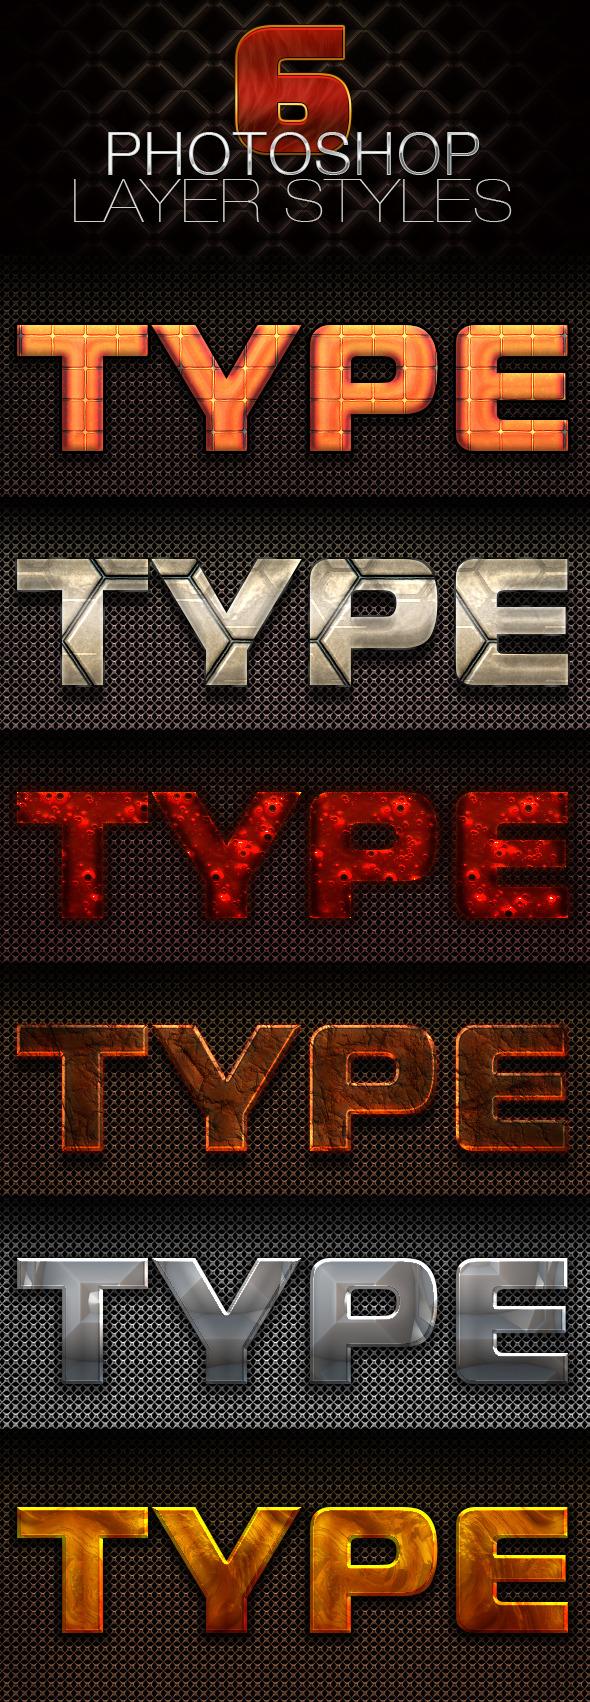 6 Photoshop Layer Styles - Styles Photoshop